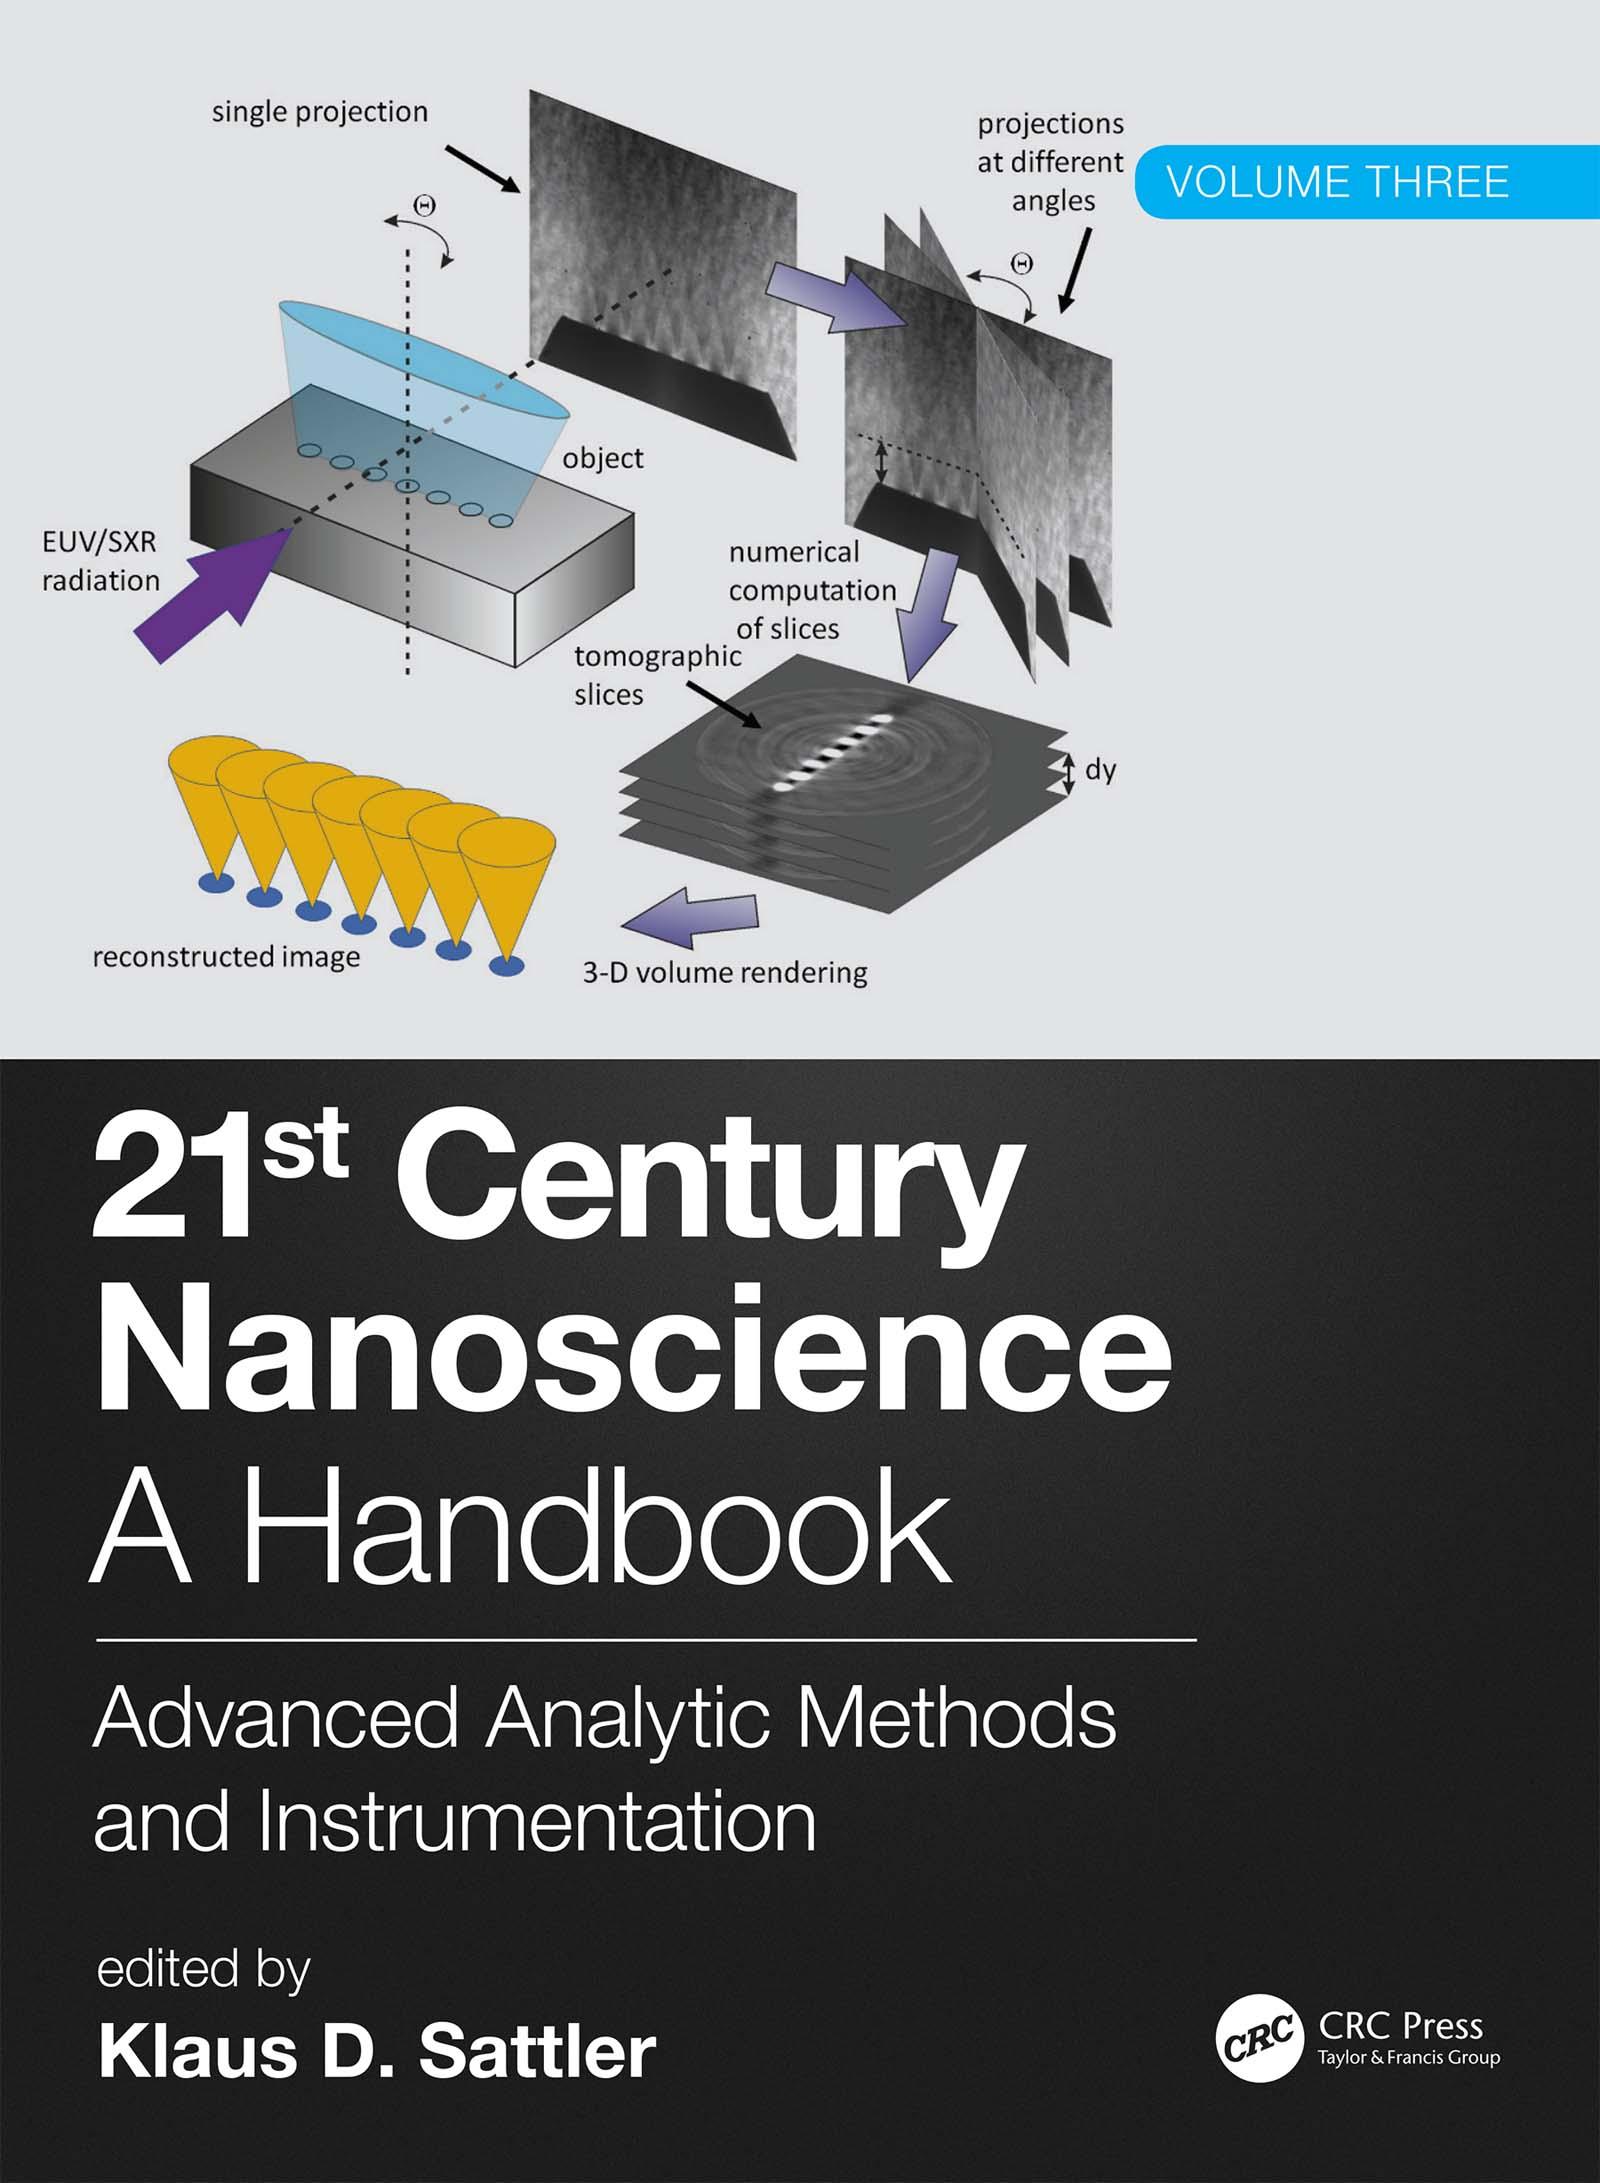 21st Century Nanoscience - A Handbook